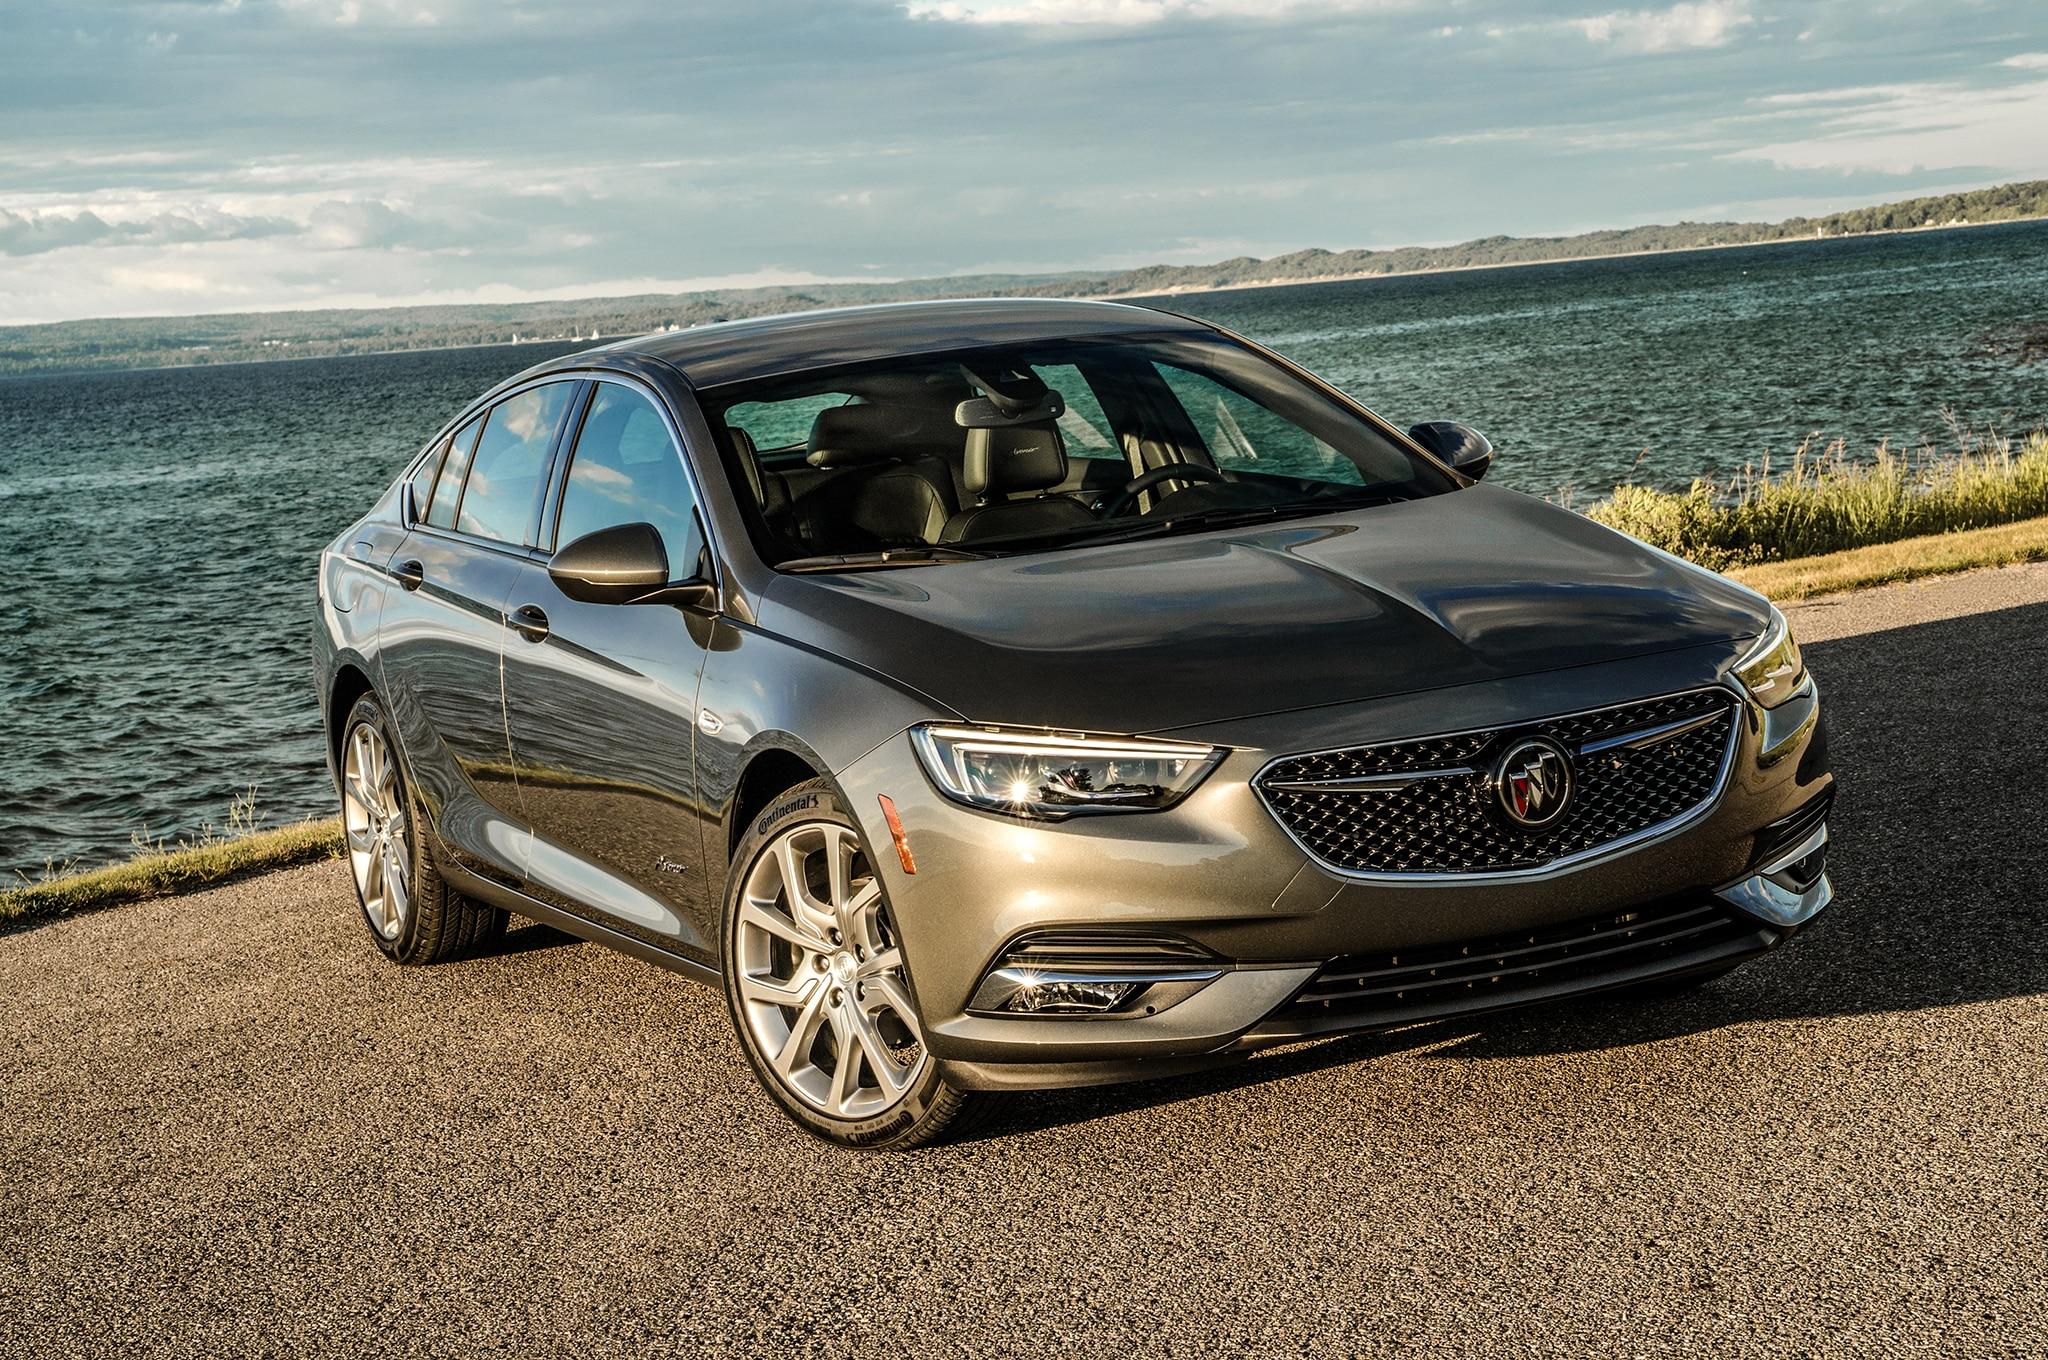 2019 buick regal sportback gets fancy avenir trim level